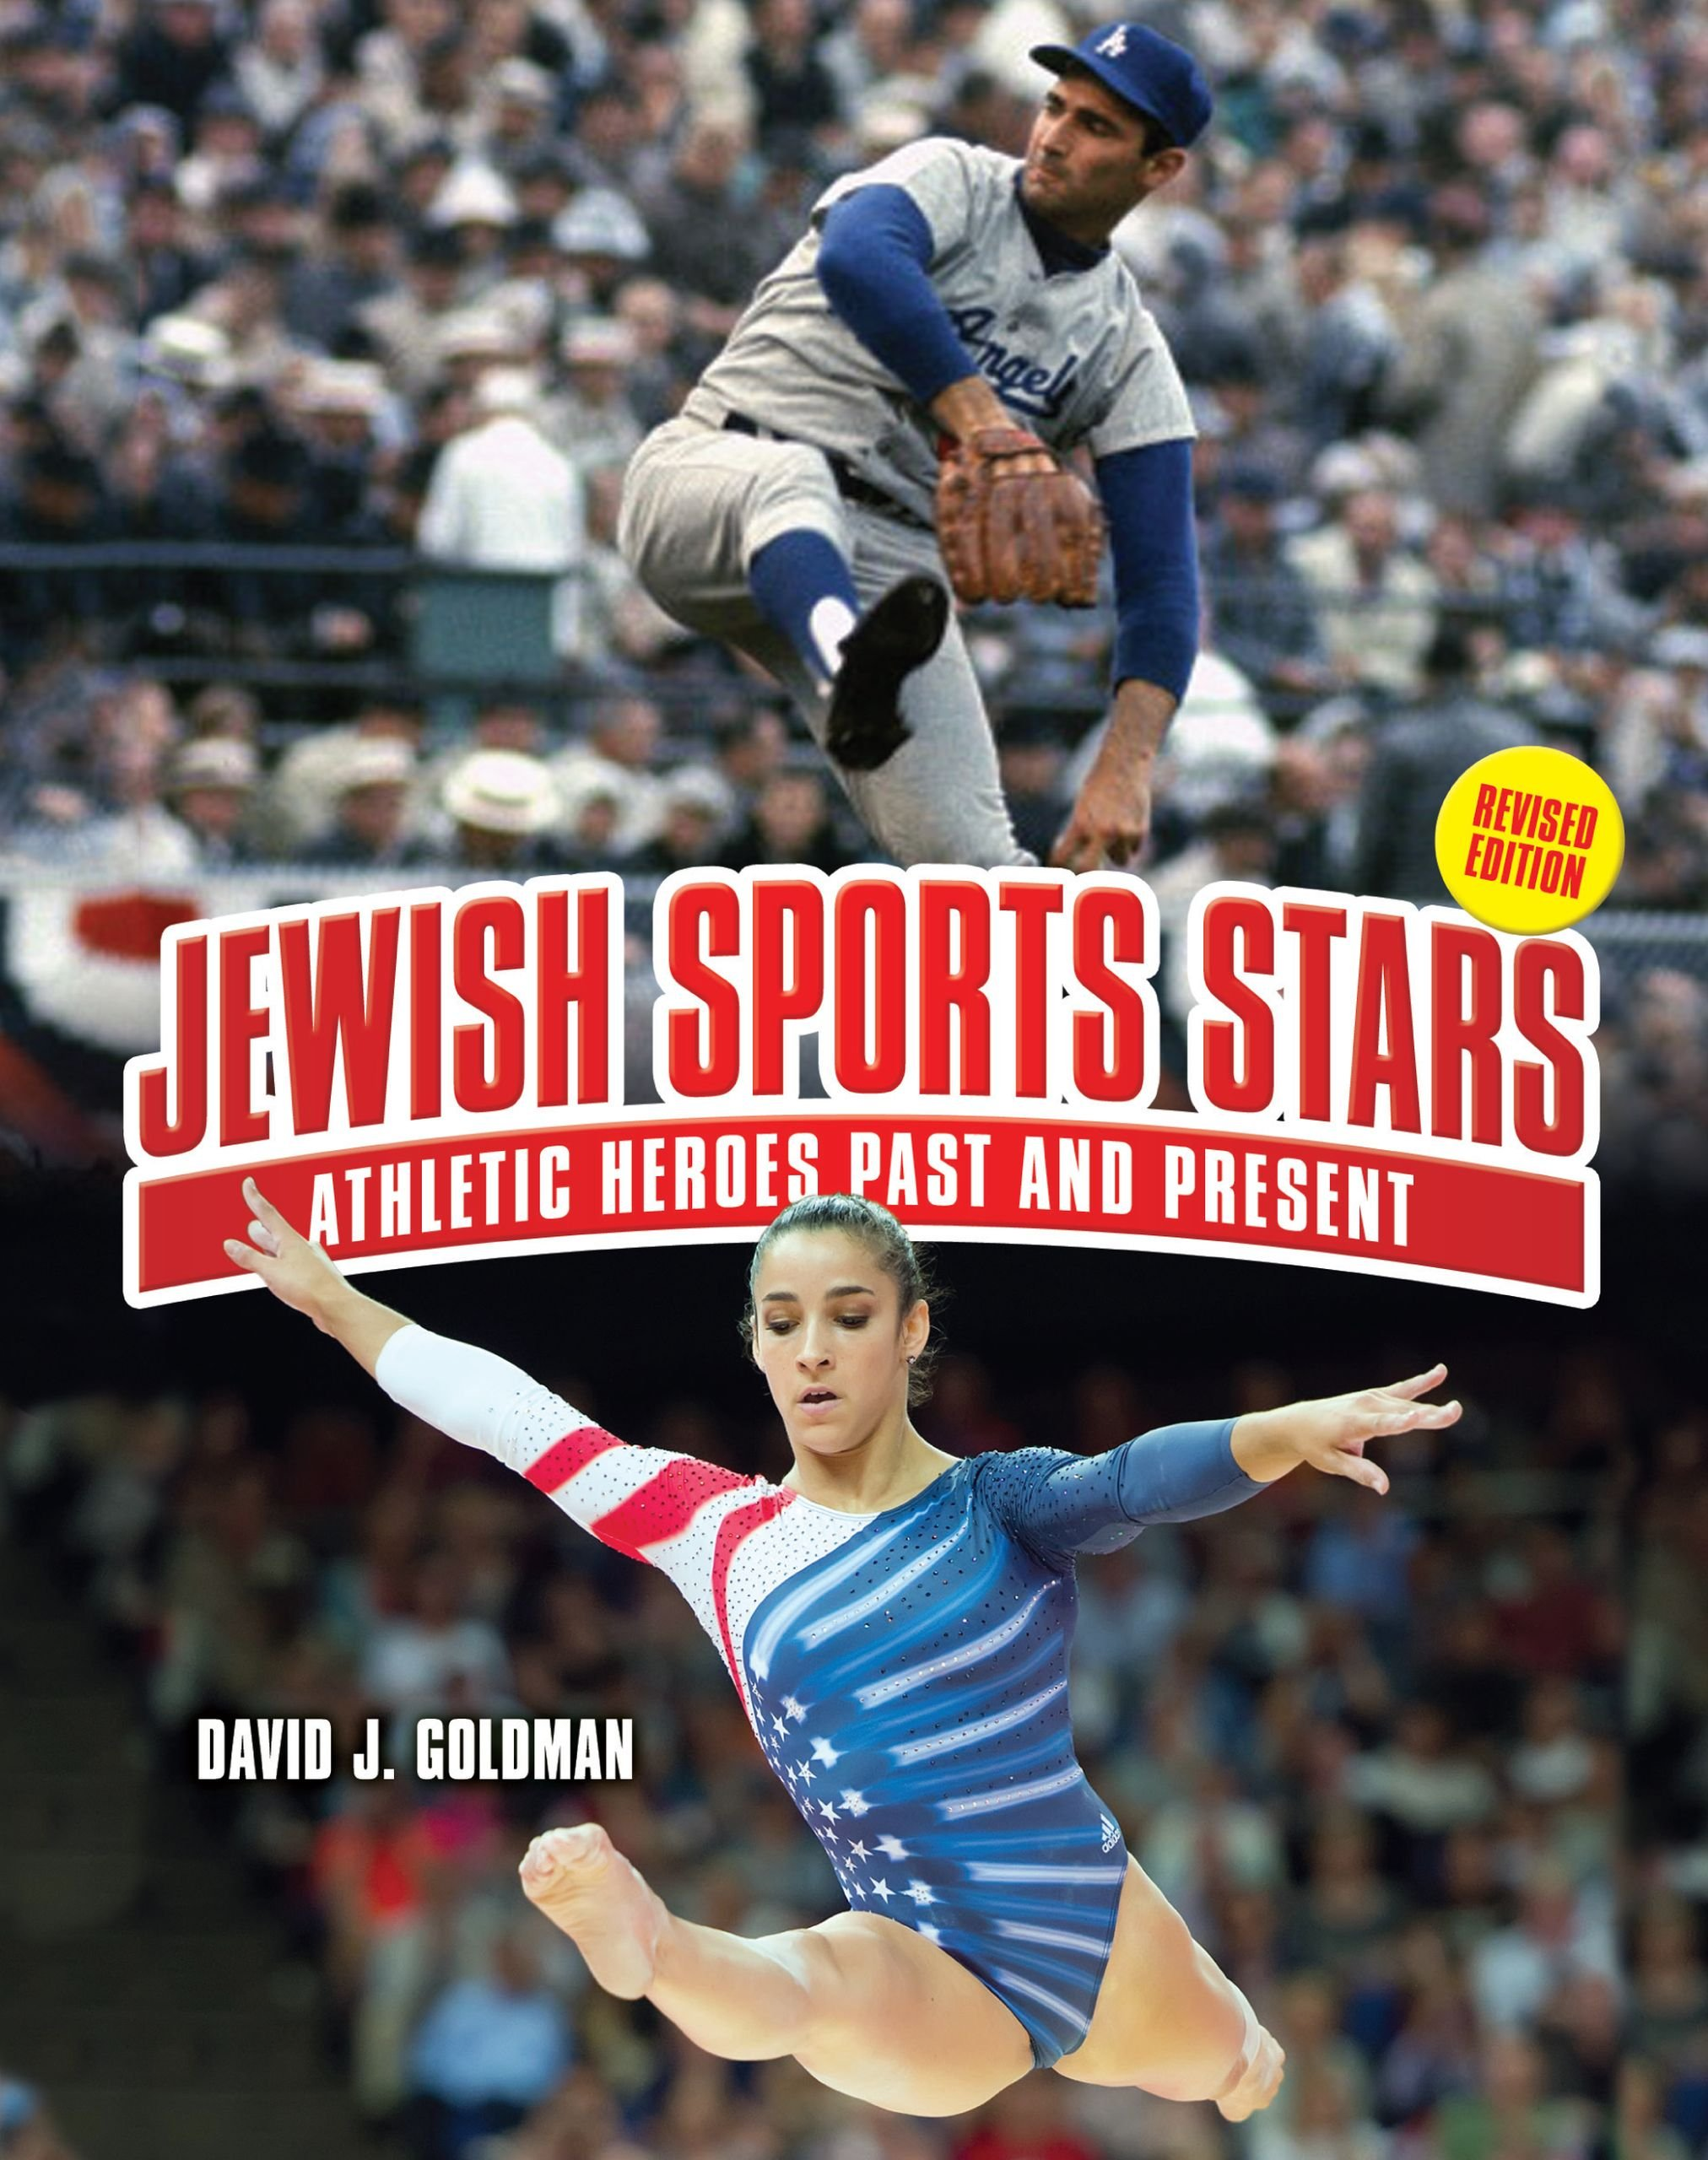 Jewish Sports Stars: Athletic Heroes Past and Present: David J. Goldman:  9781467712064: Amazon.com: Books